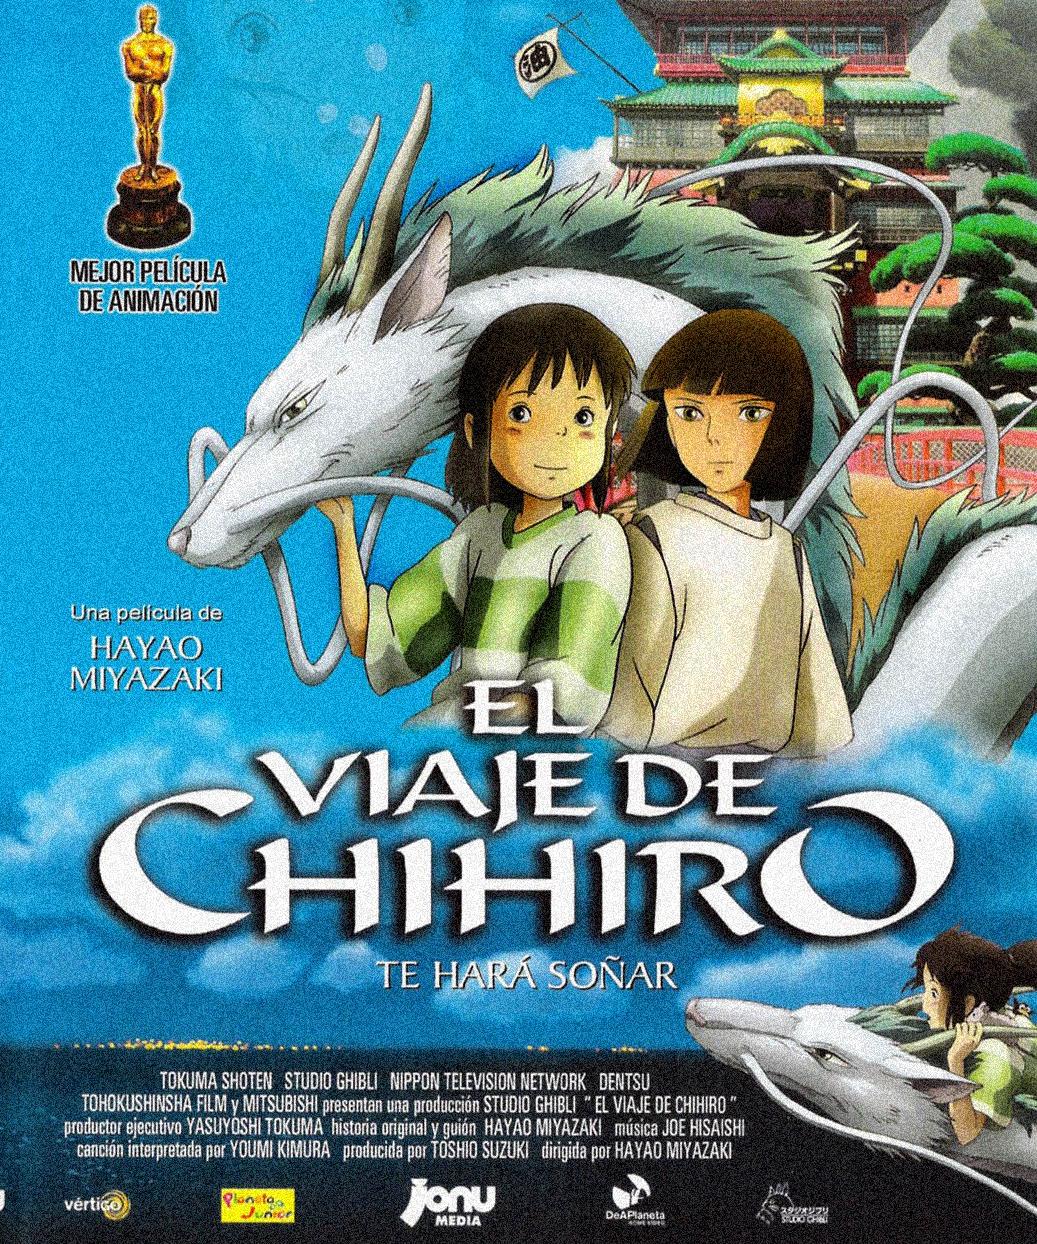 El viaje de Chihiro.